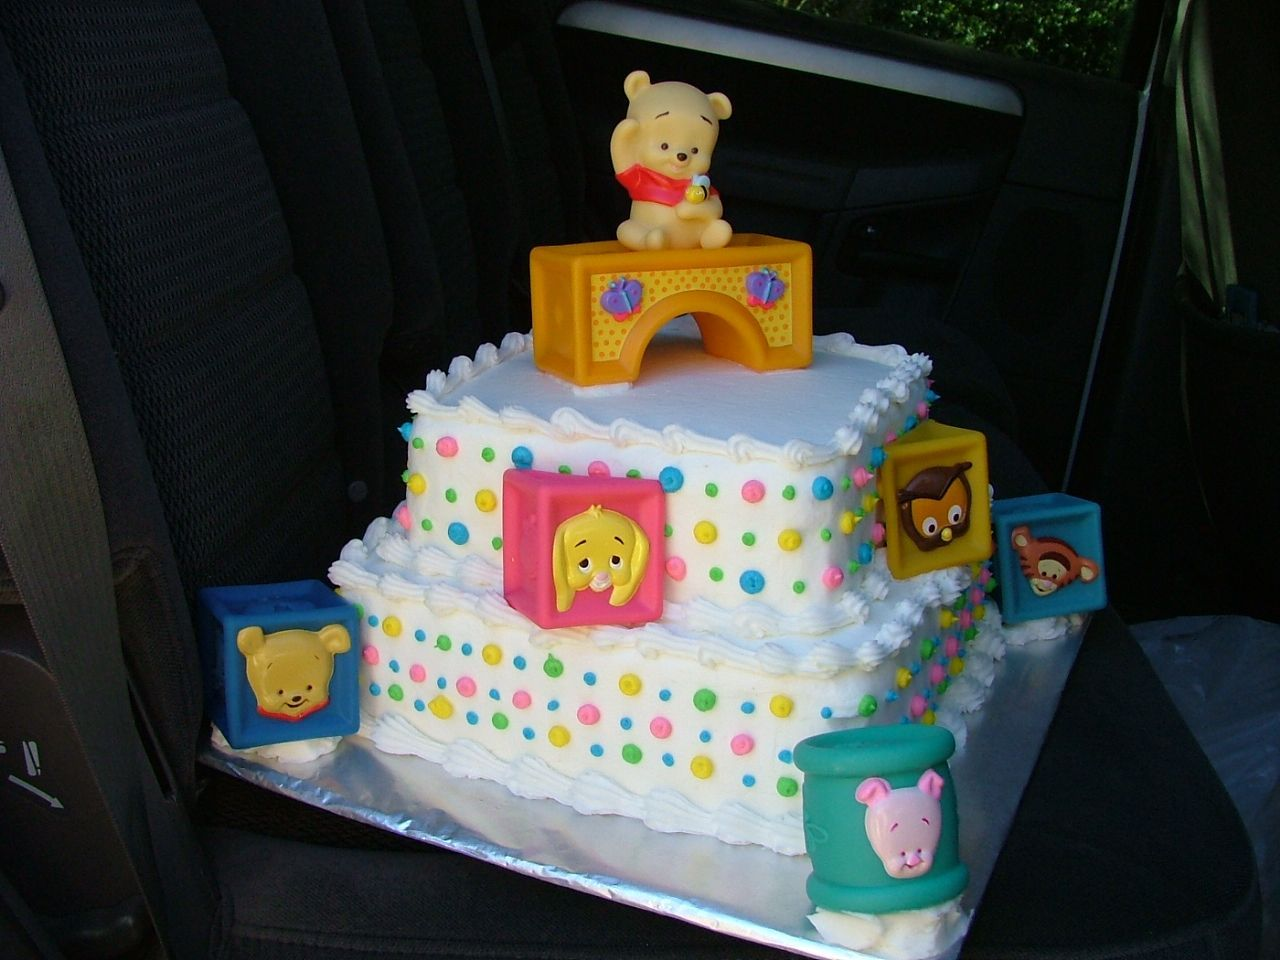 Baby Shower Cakes | Winnie The Pooh Baby Shower Cake